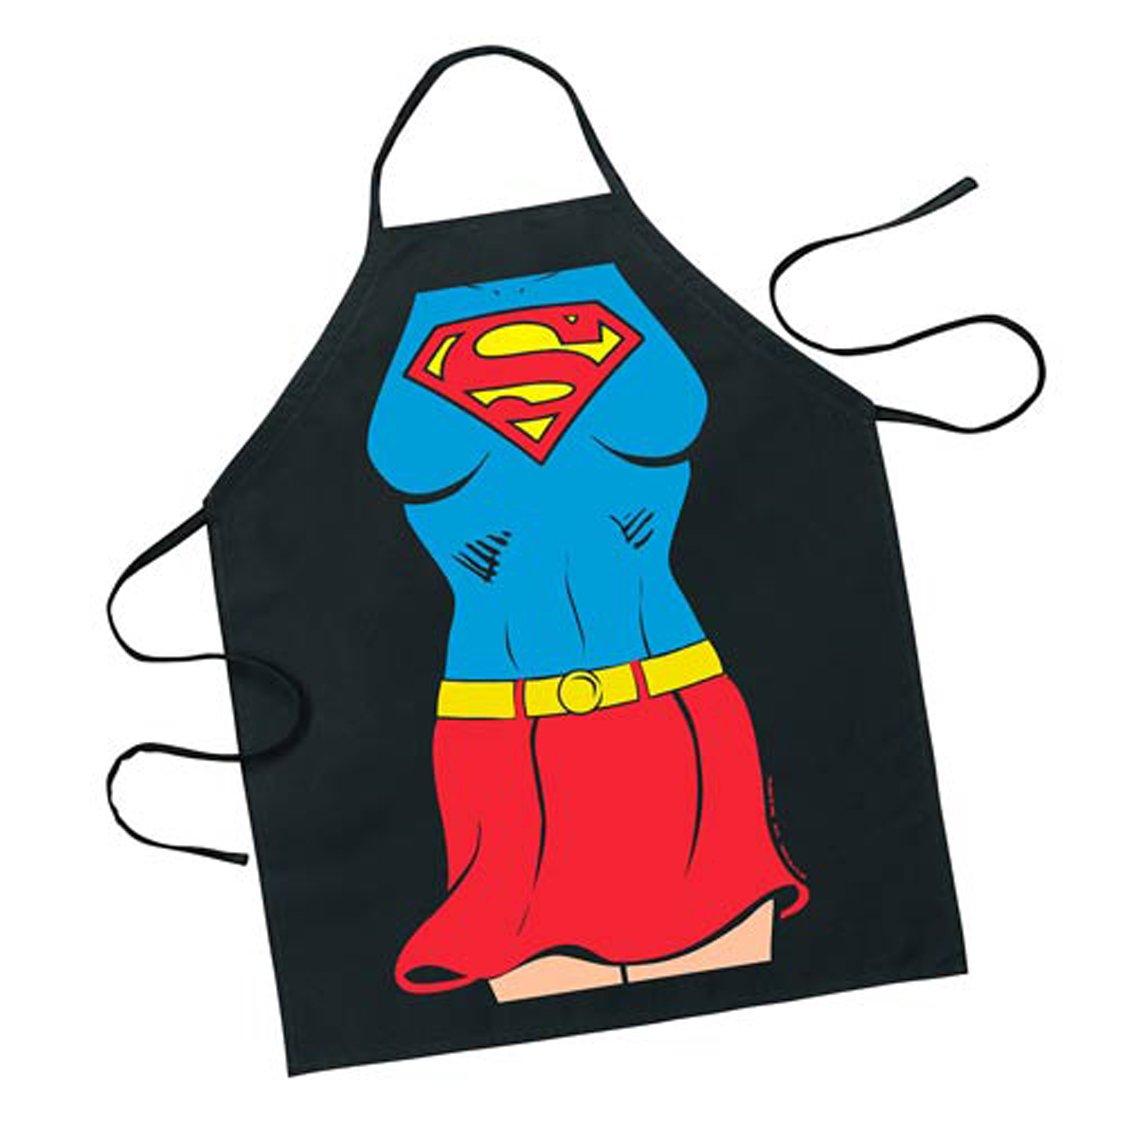 Blue apron justice - Blue Apron Justice 35